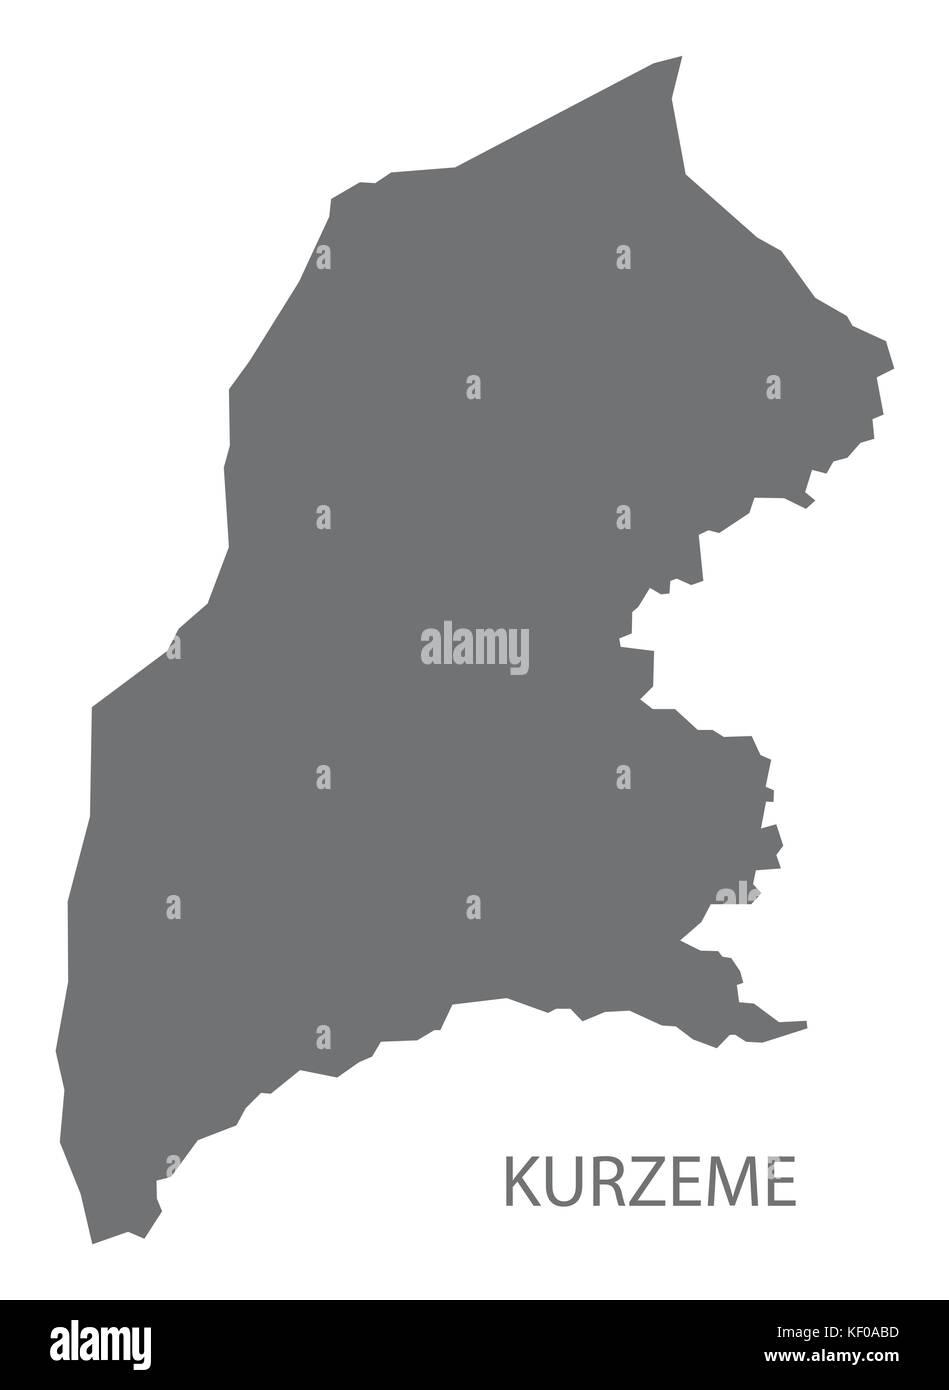 Kurzeme administrative division map of Latvia grey illustration silhouette shape - Stock Image